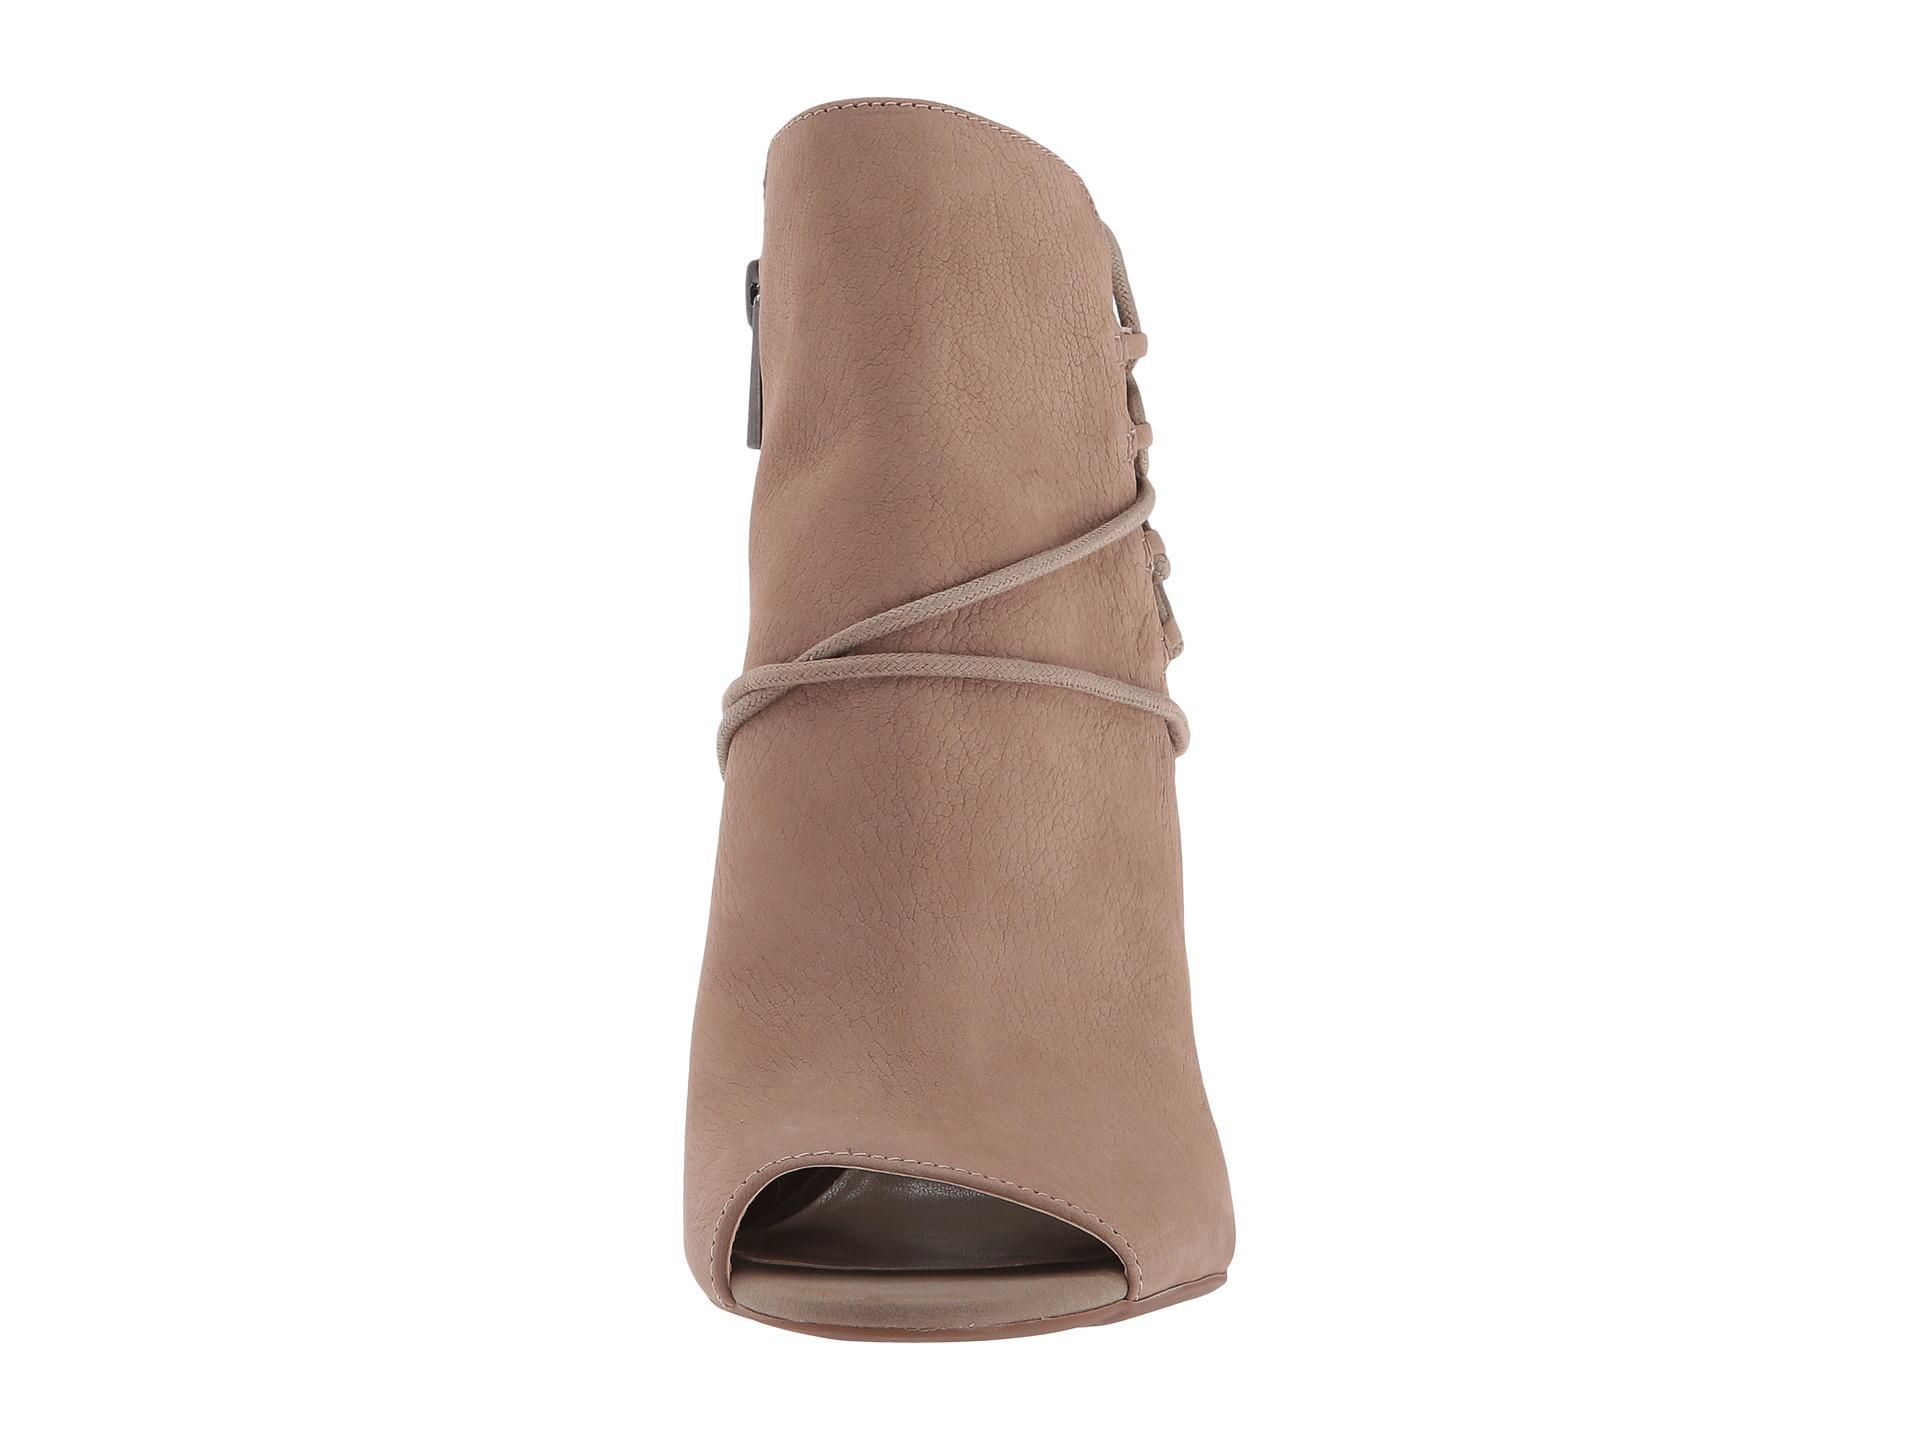 Jessica Simpson Womens Remni Open-Toe Bootie Shoe